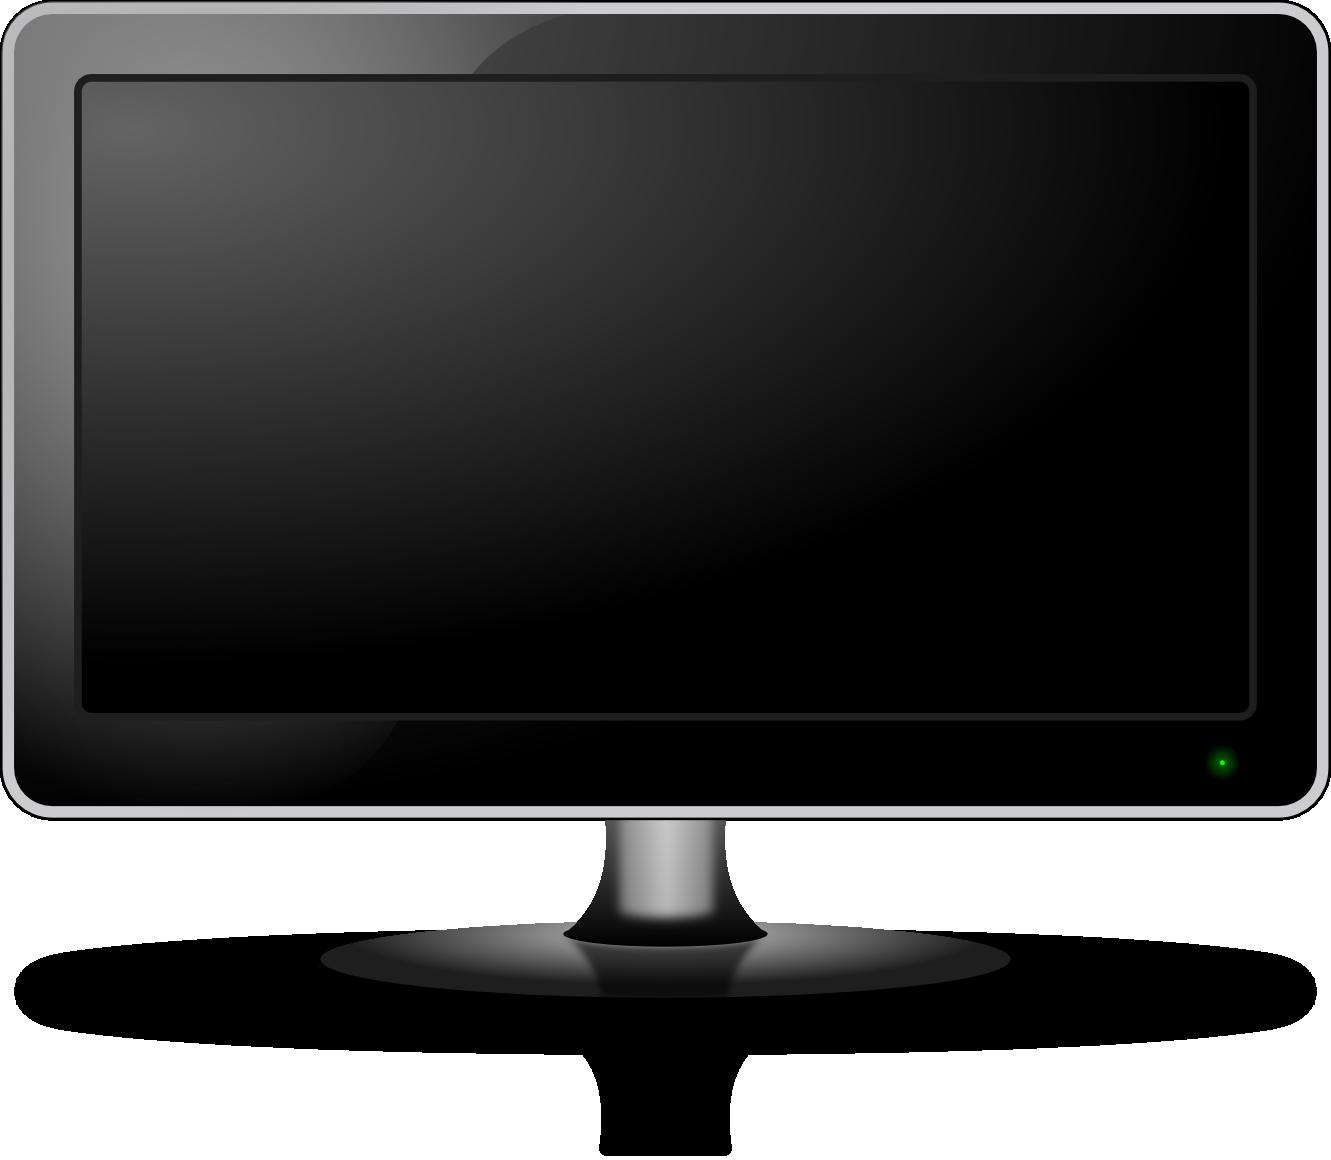 Lcd Monitor Png - Lcd Monitor Png Hdpng.com 1331, Transparent background PNG HD thumbnail